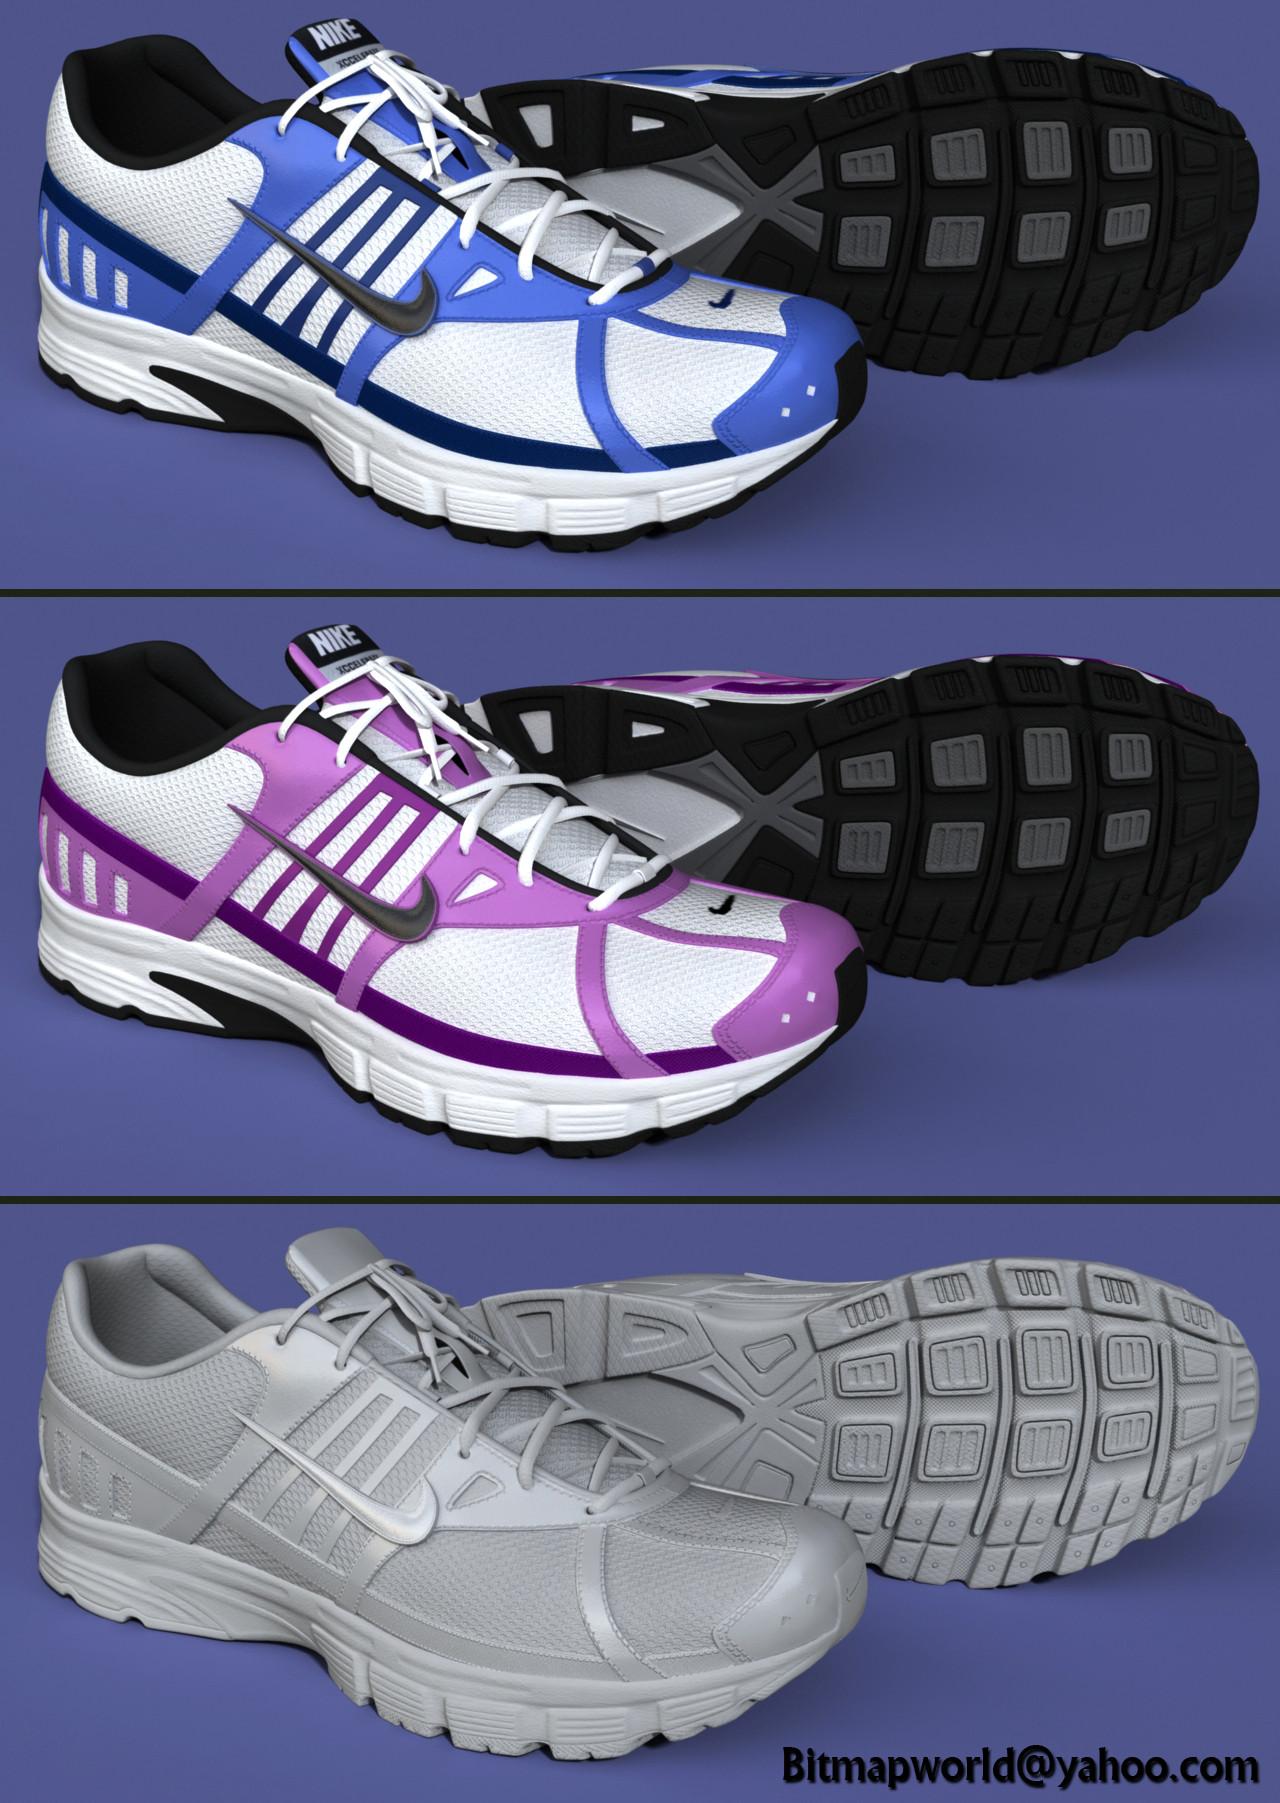 Sport_shoes_female_prewiev.jpg